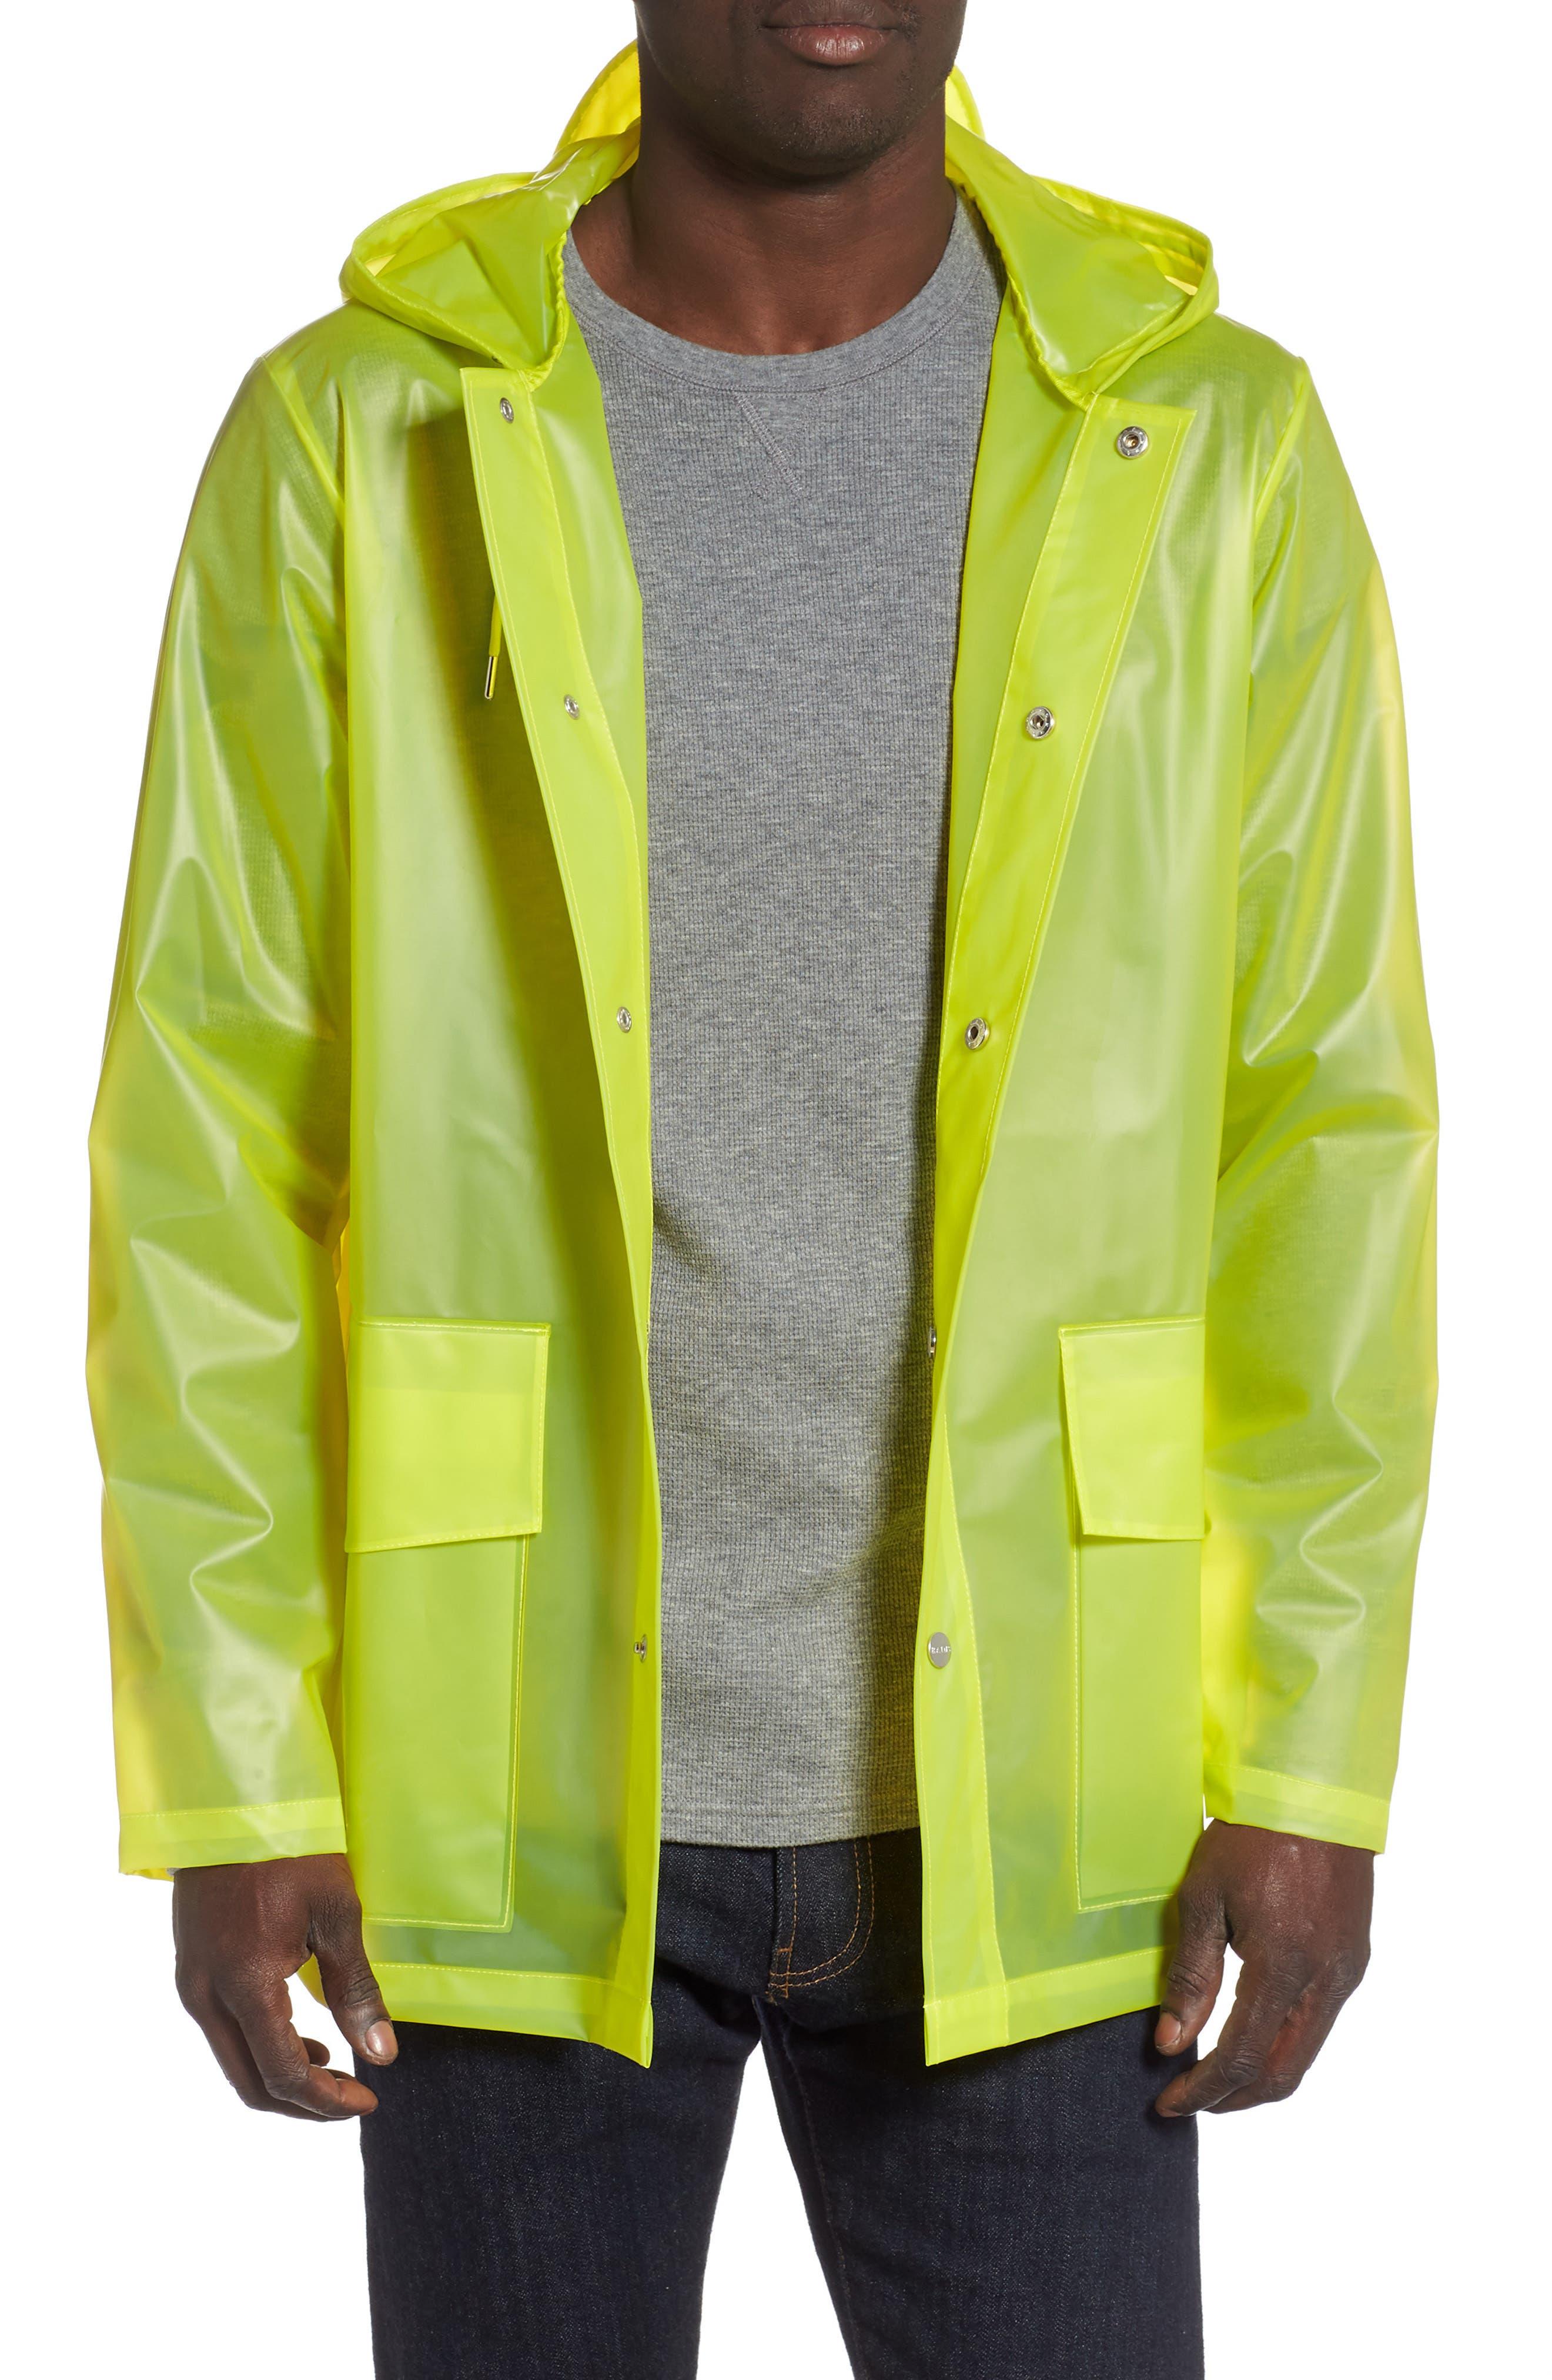 Rains Hooded Rain Jacket, Yellow